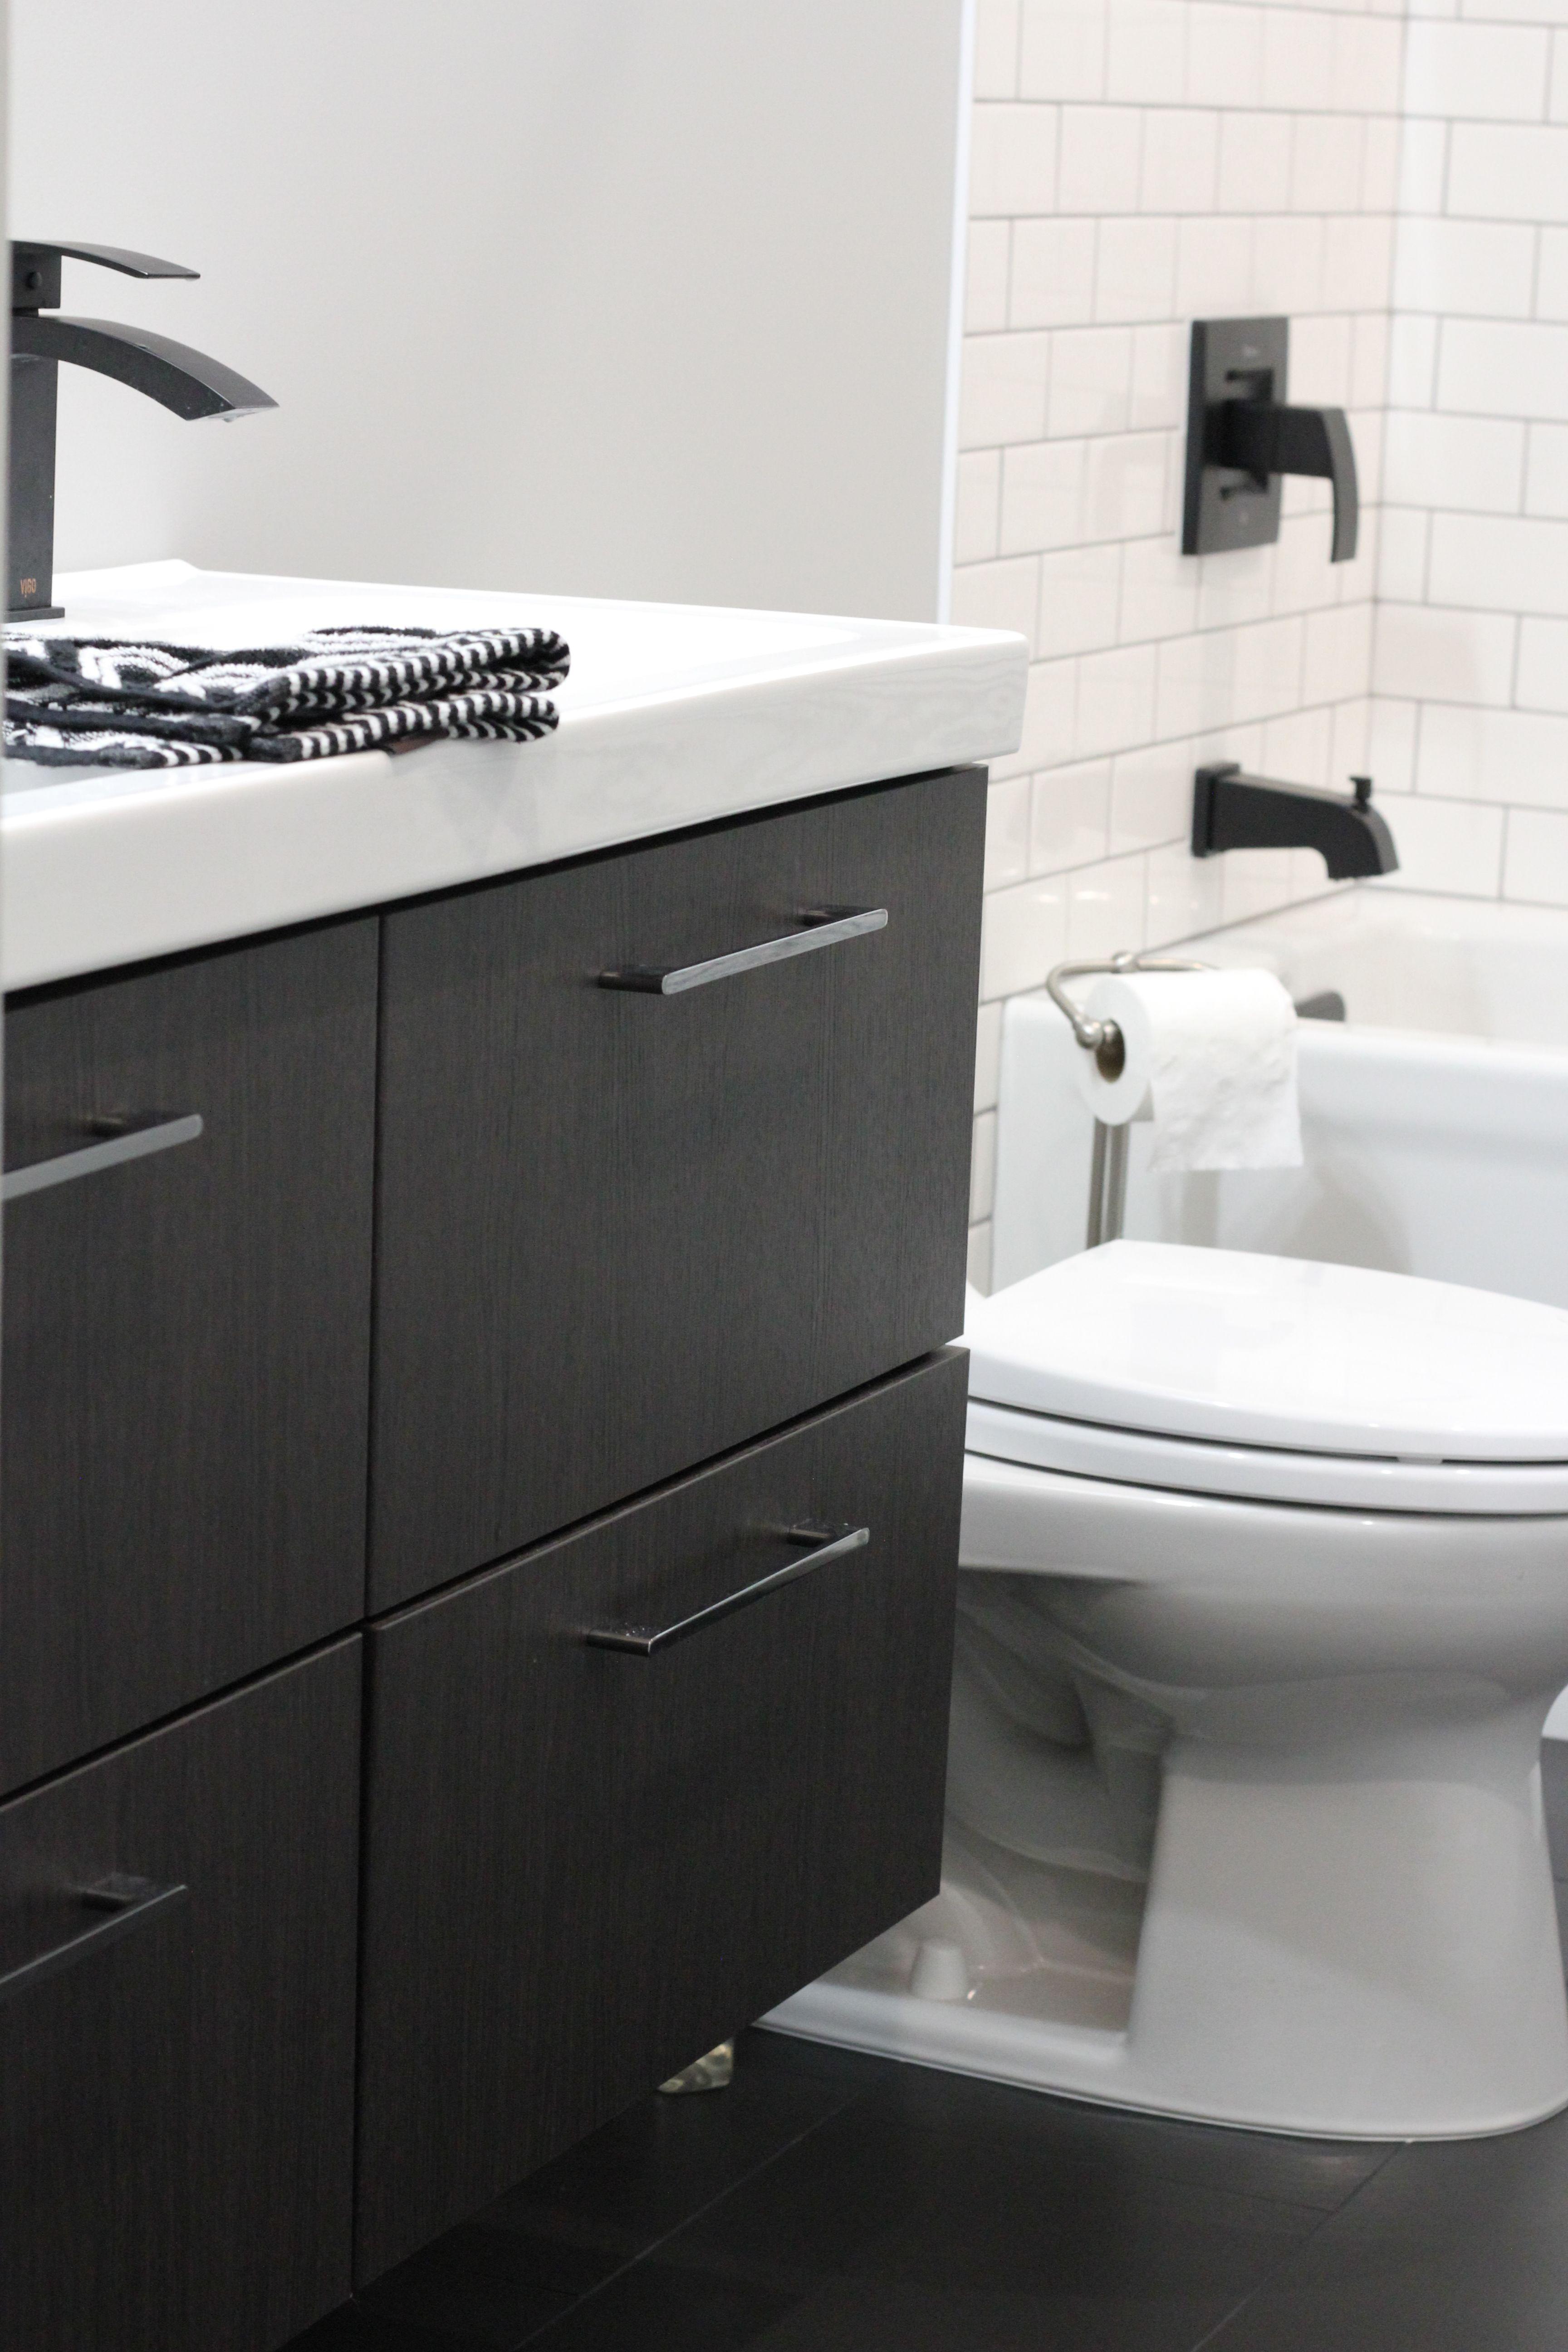 Home decor, bathroom remodel, White subway tile, delorean gray grout ...